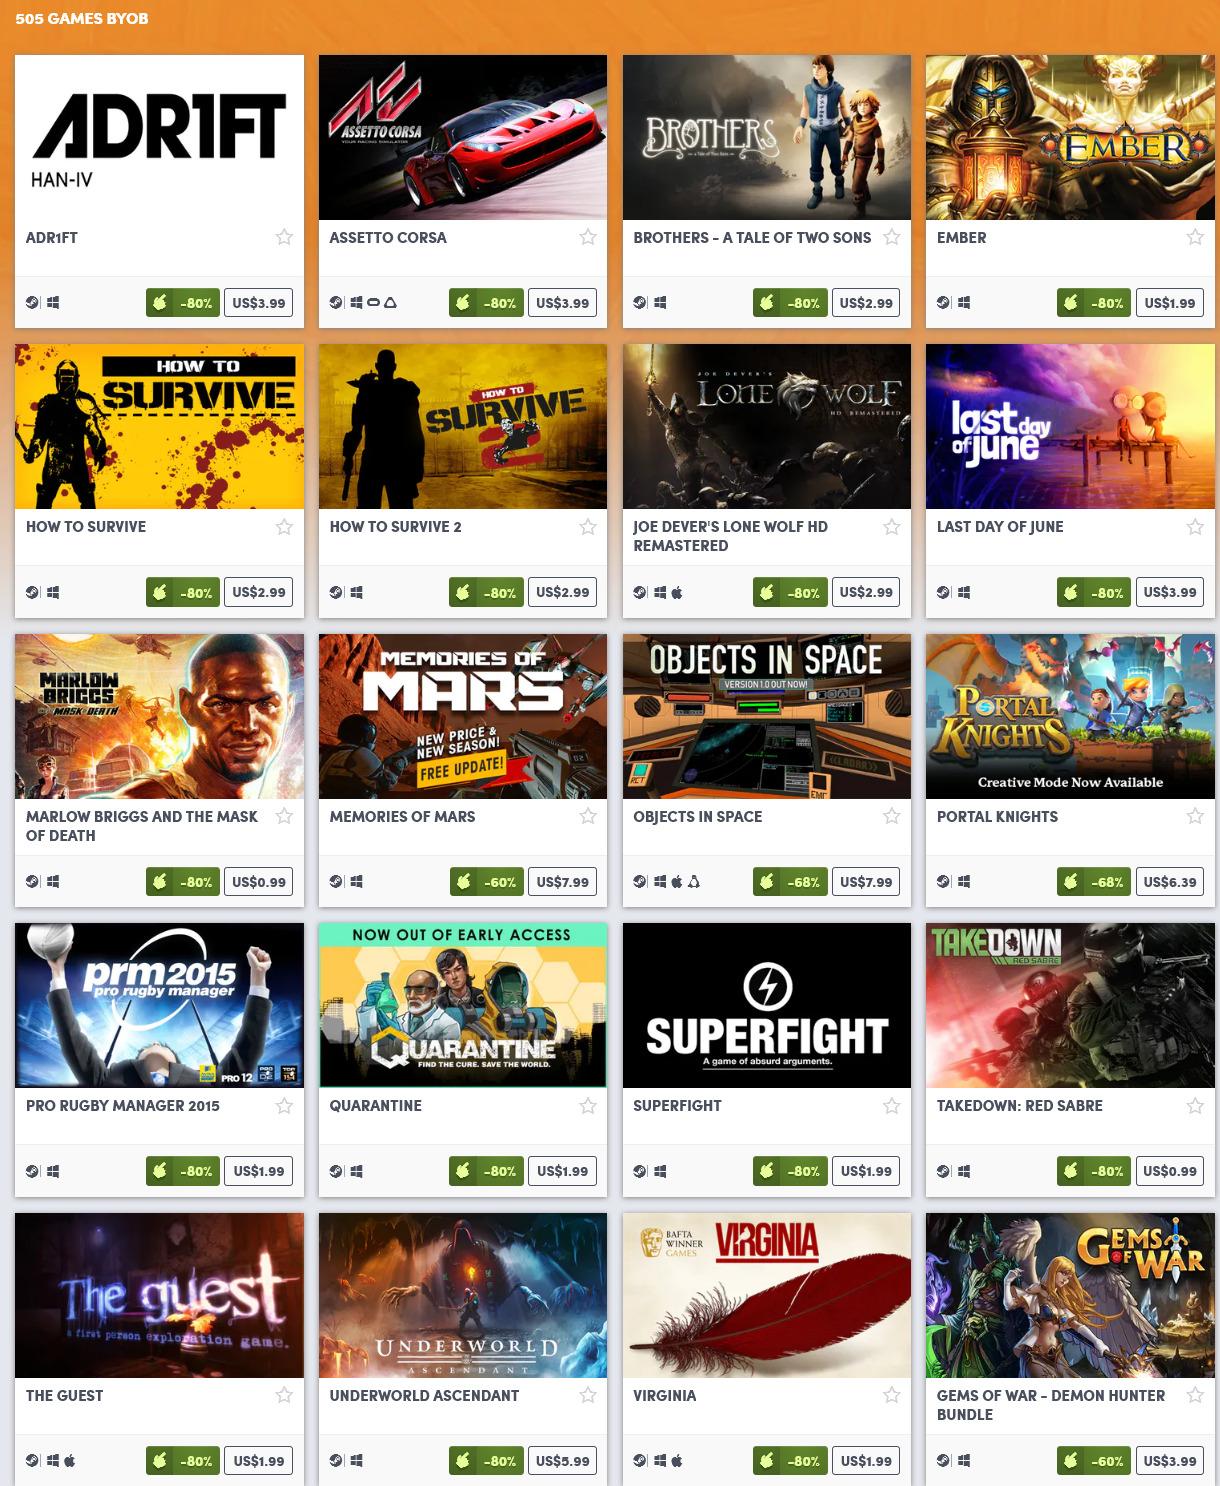 Screenshot_2020-06-02 505 Games BYOB Humble Store.jpg